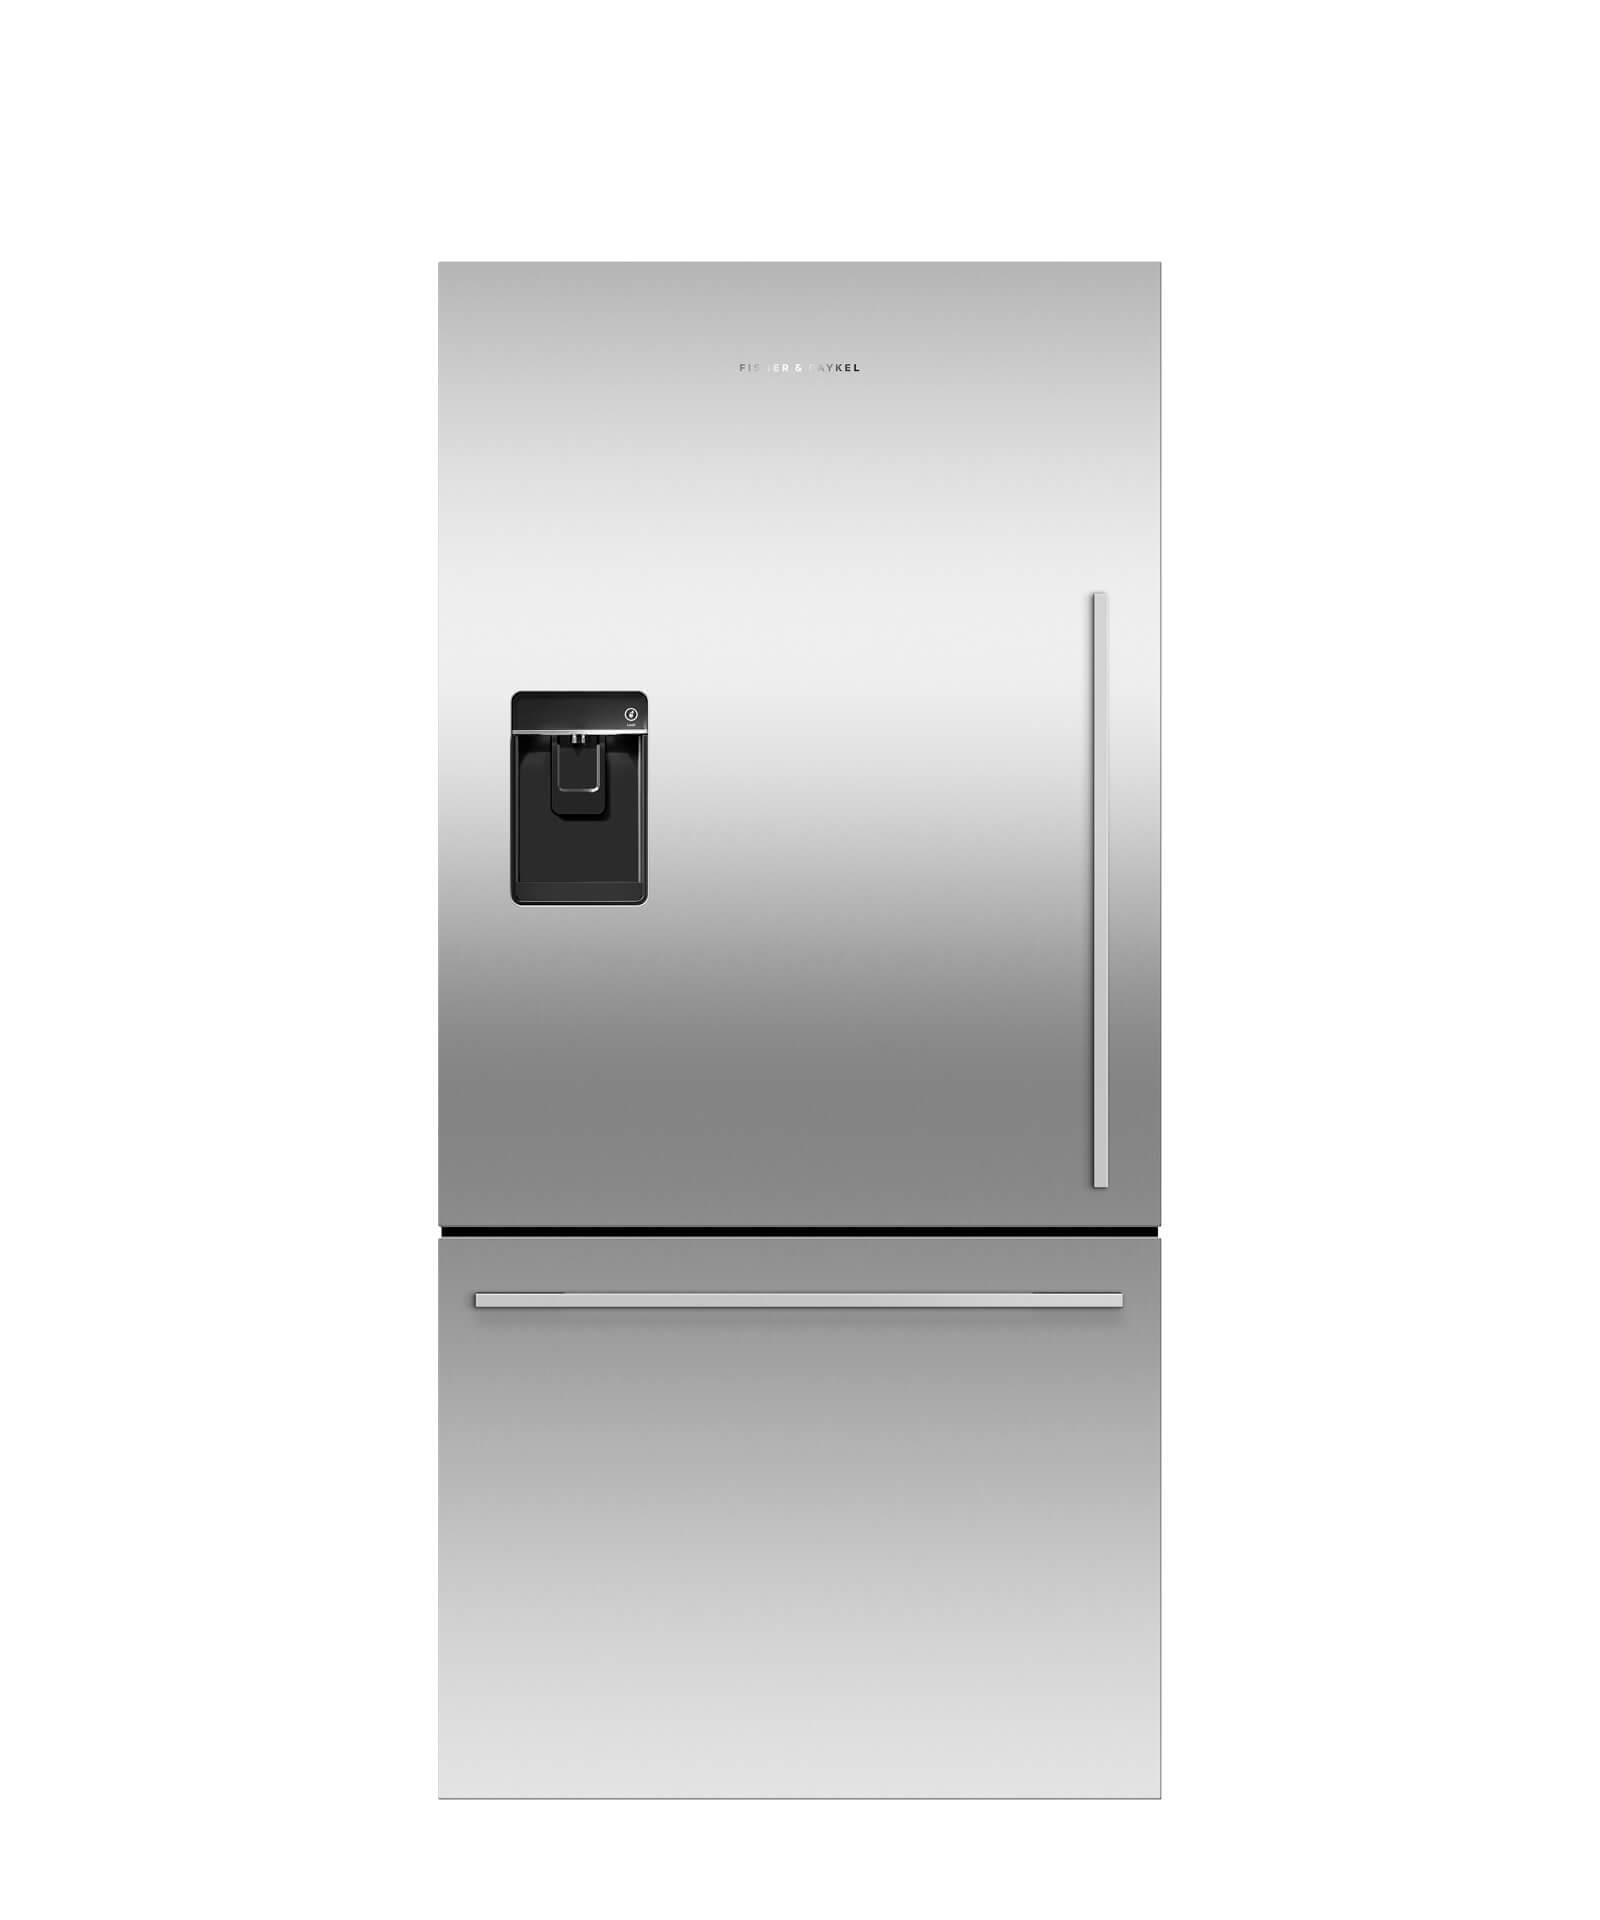 SCRATCH & DENT--Counter Depth Refrigerator 17 cu ft, Ice & Water